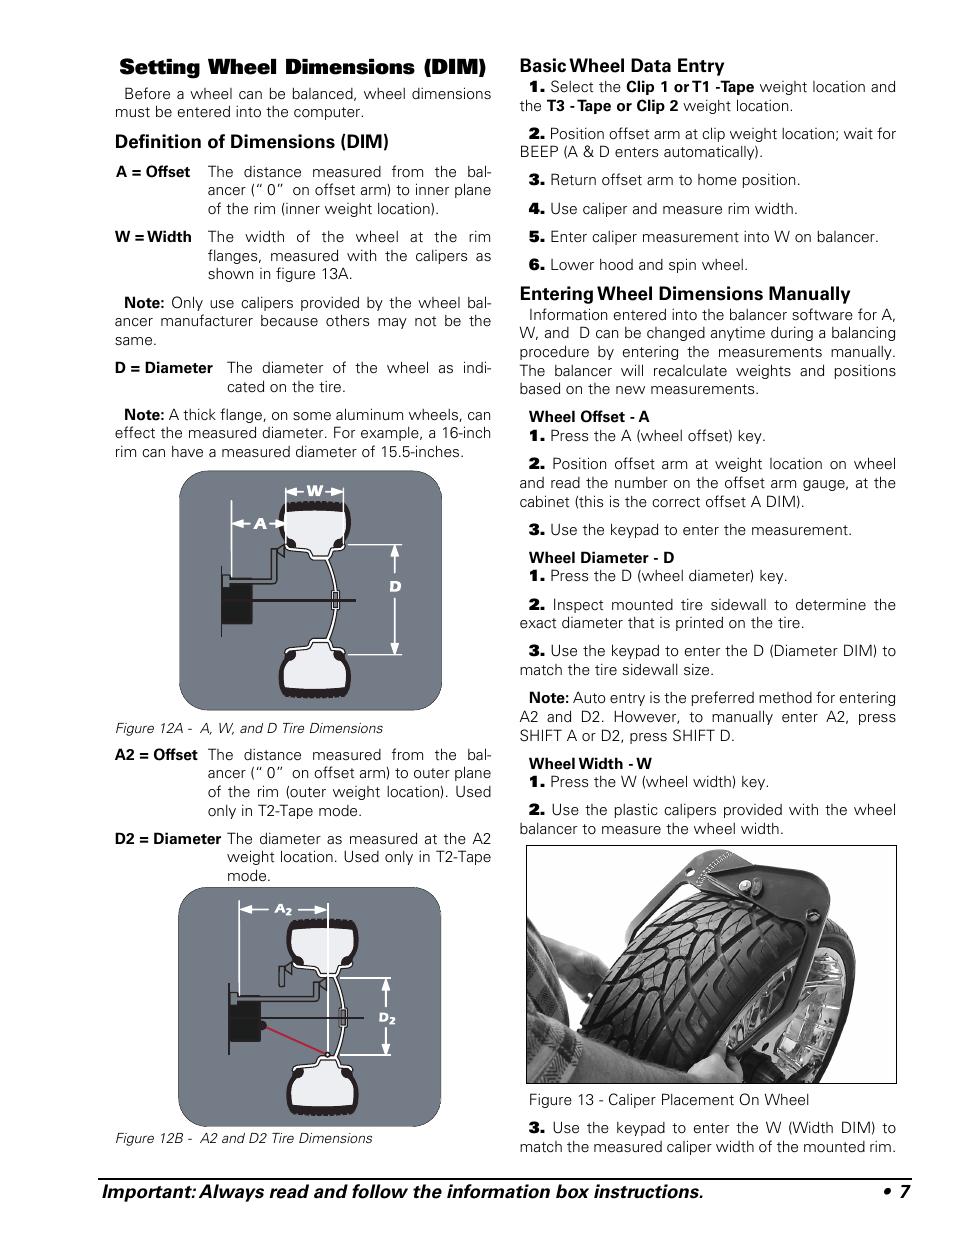 coats 1001 user manual